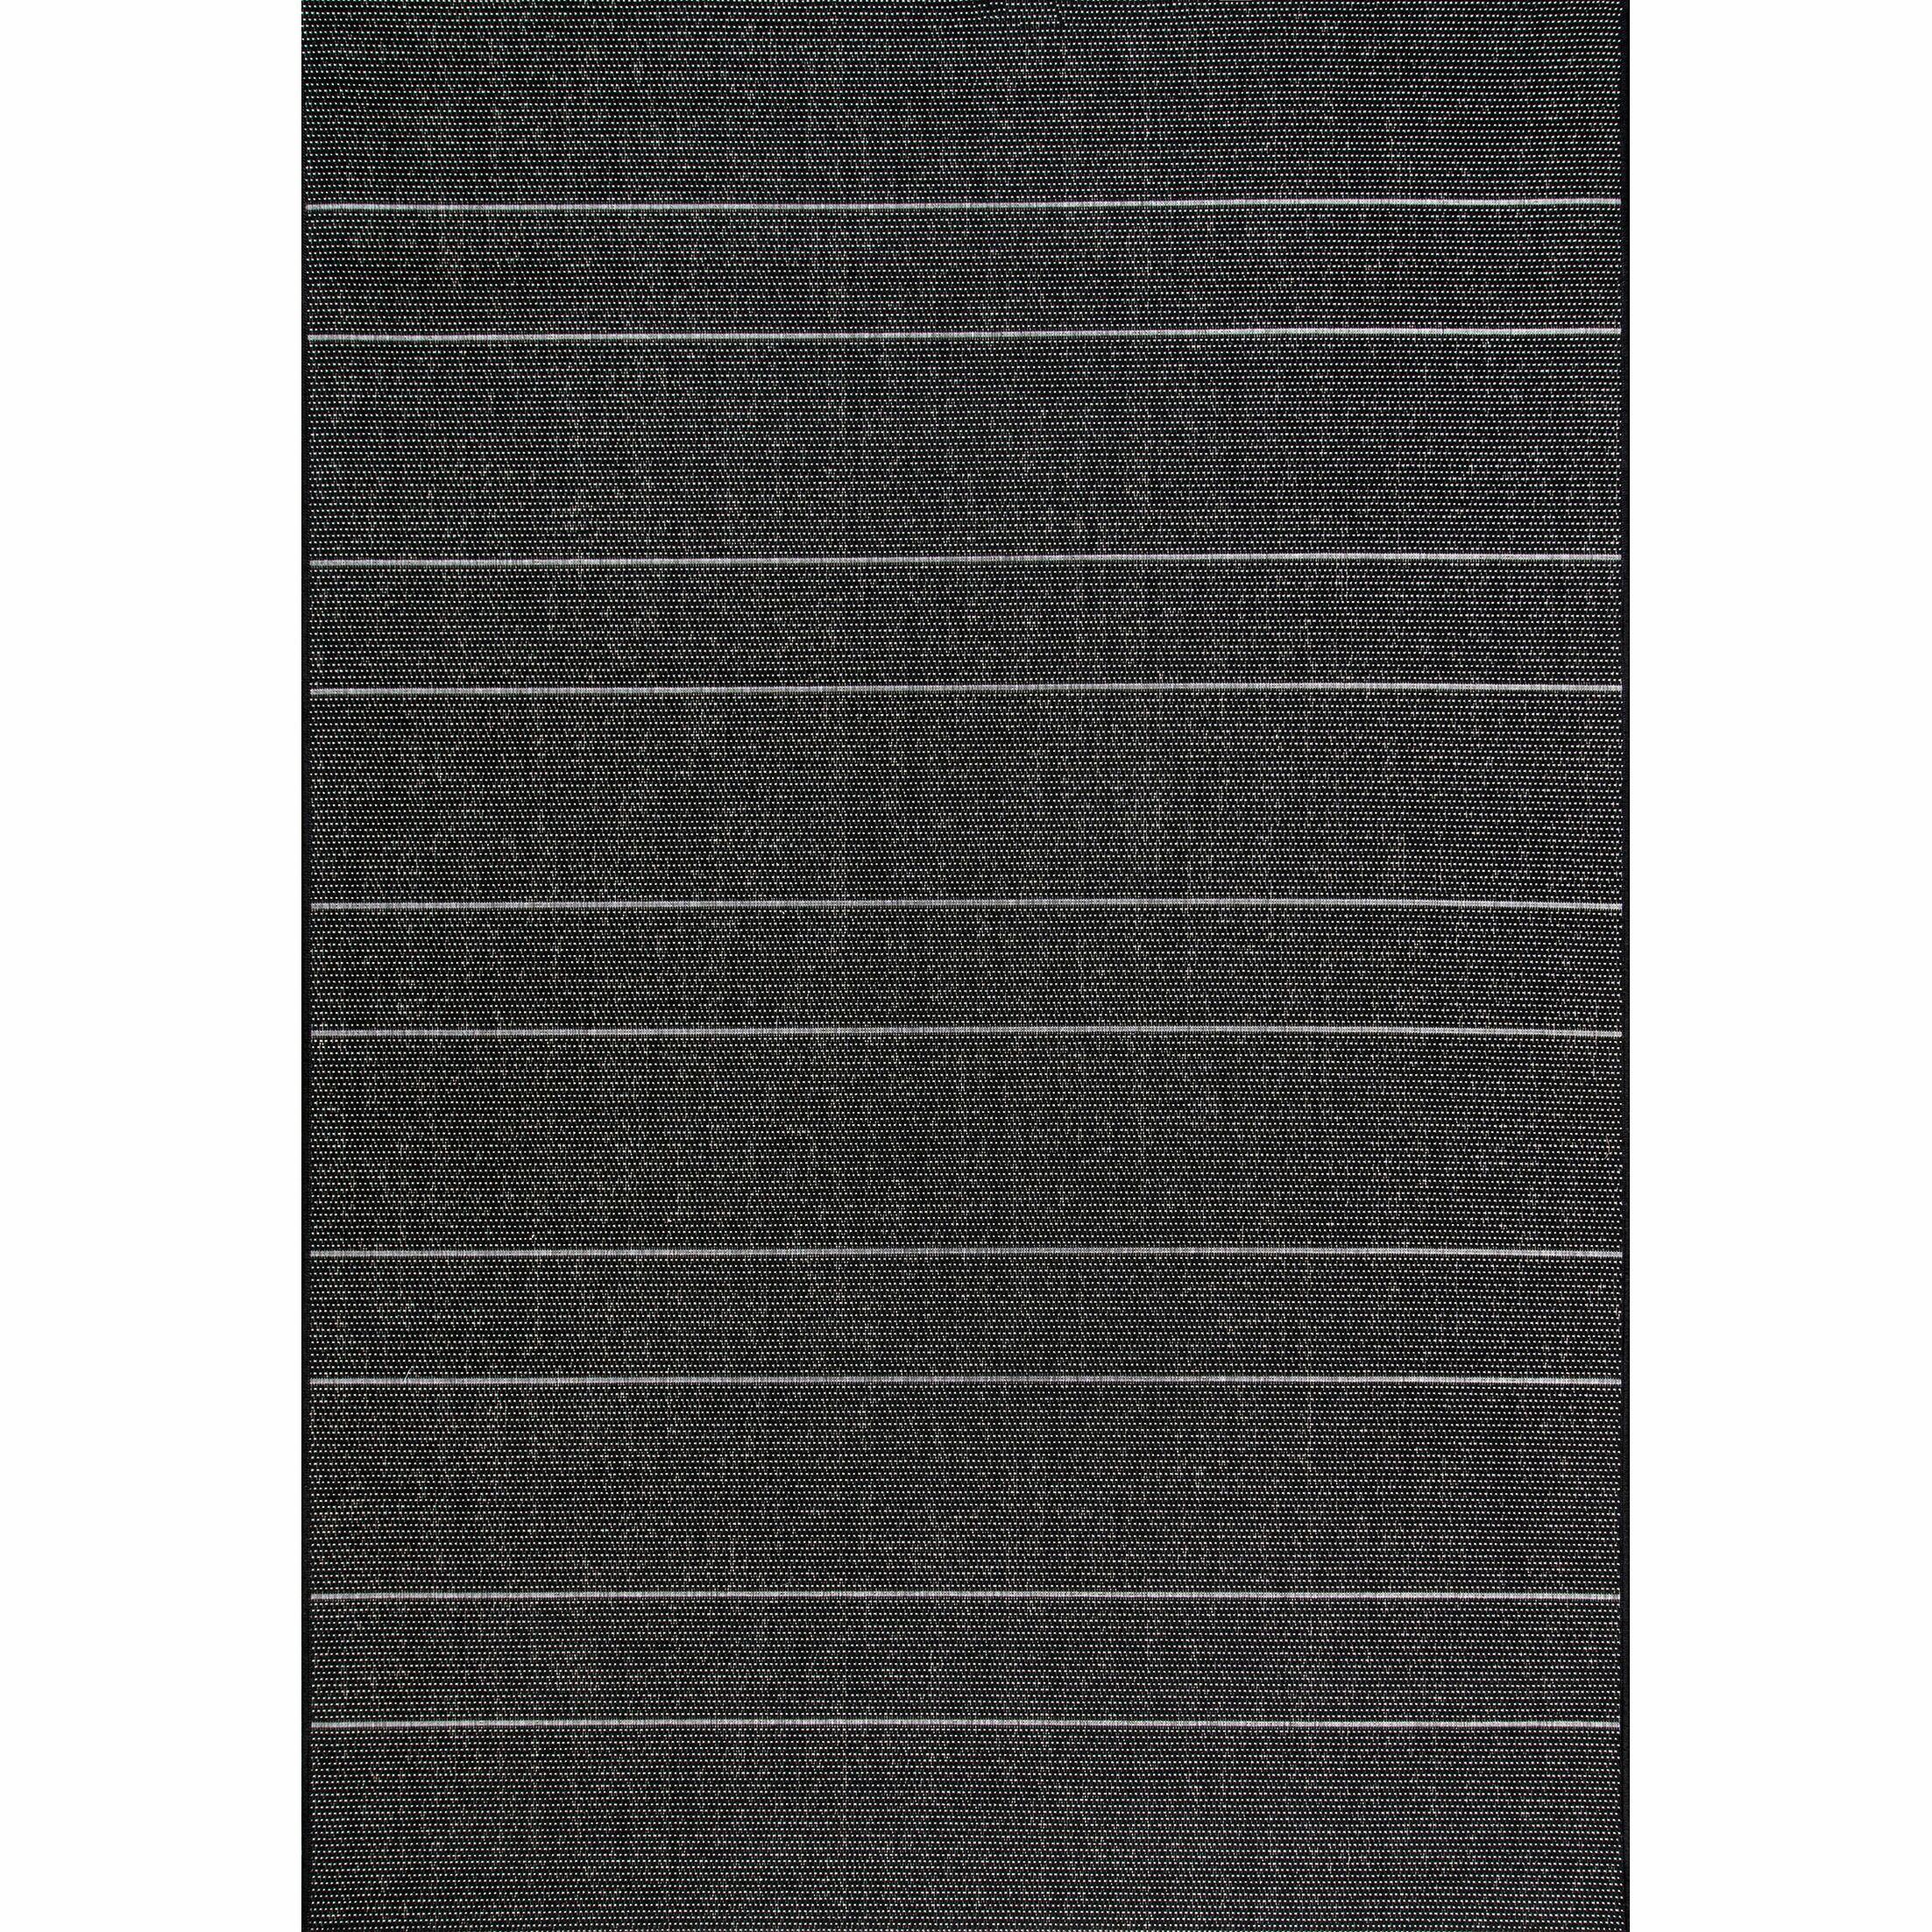 Randall Black Indoor/Outdoor Area Rug Rug Size: Rectangle 6'3'' x 9'2''